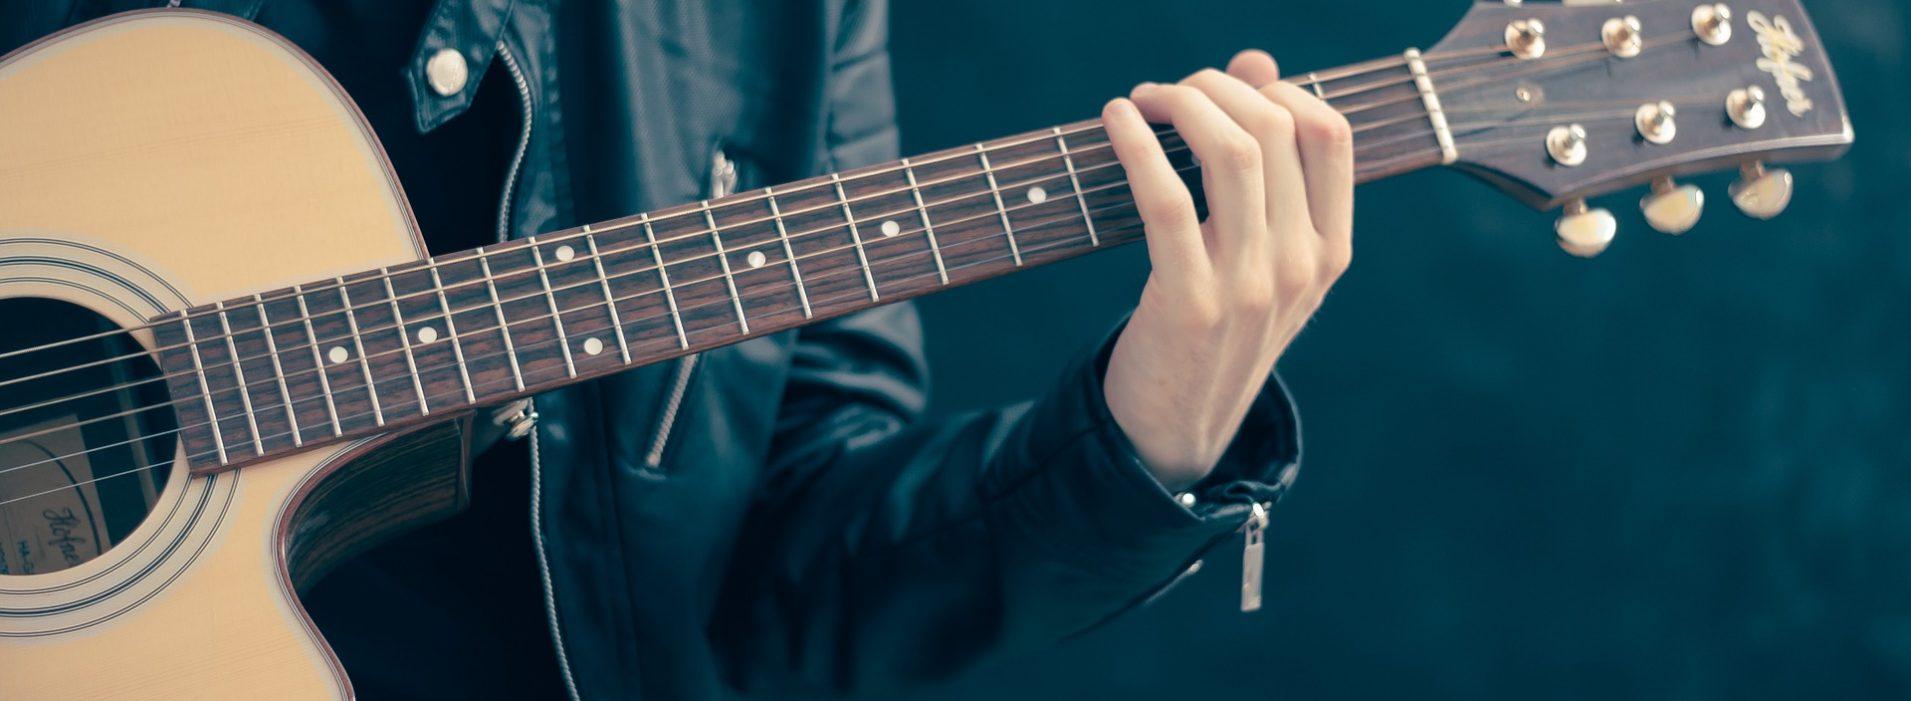 https://www.kholey.com/wp-content/uploads/2018/07/guitar-musician-hollywood-1911x701.jpg